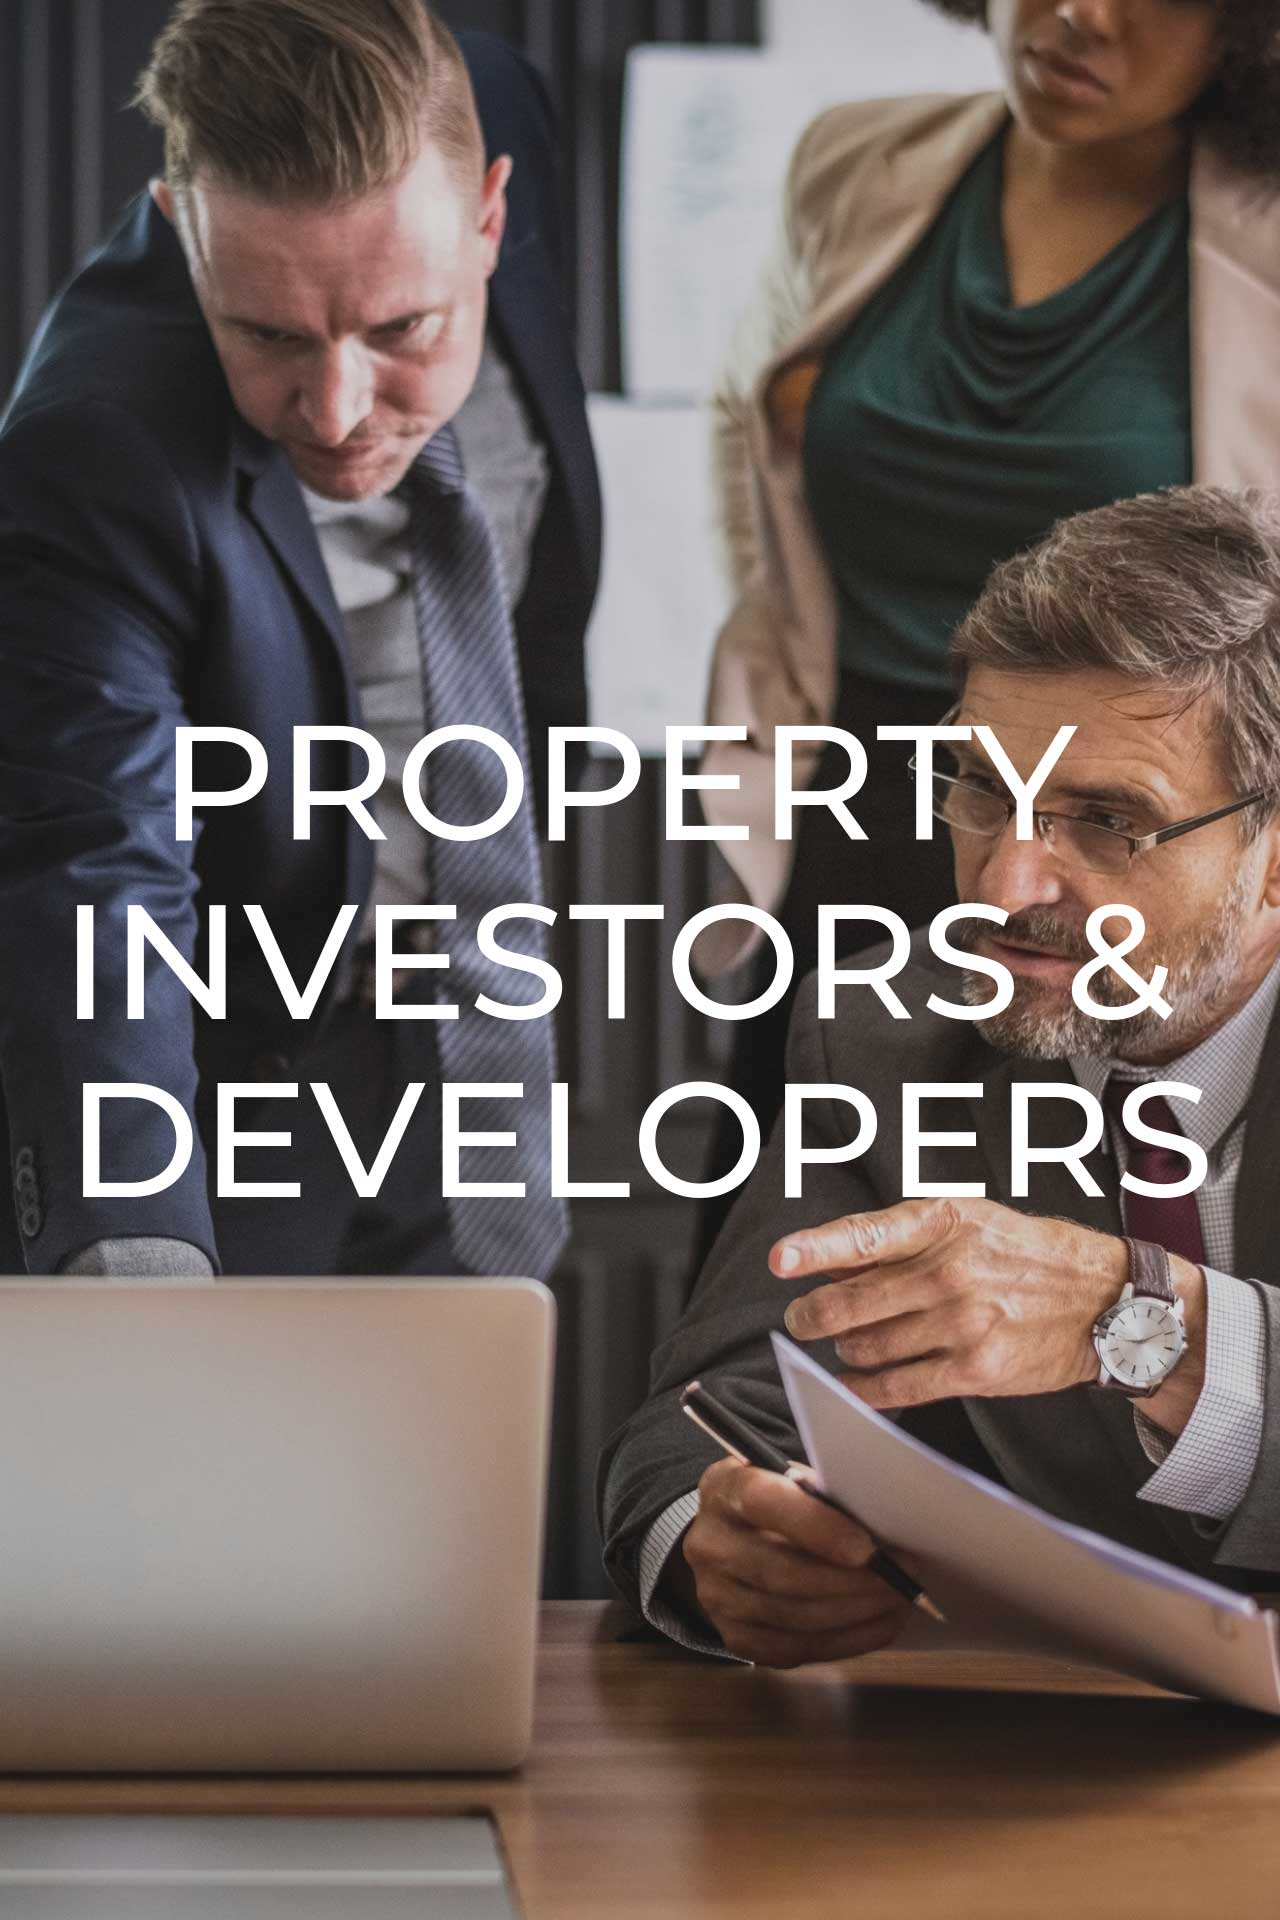 Property investors & developers